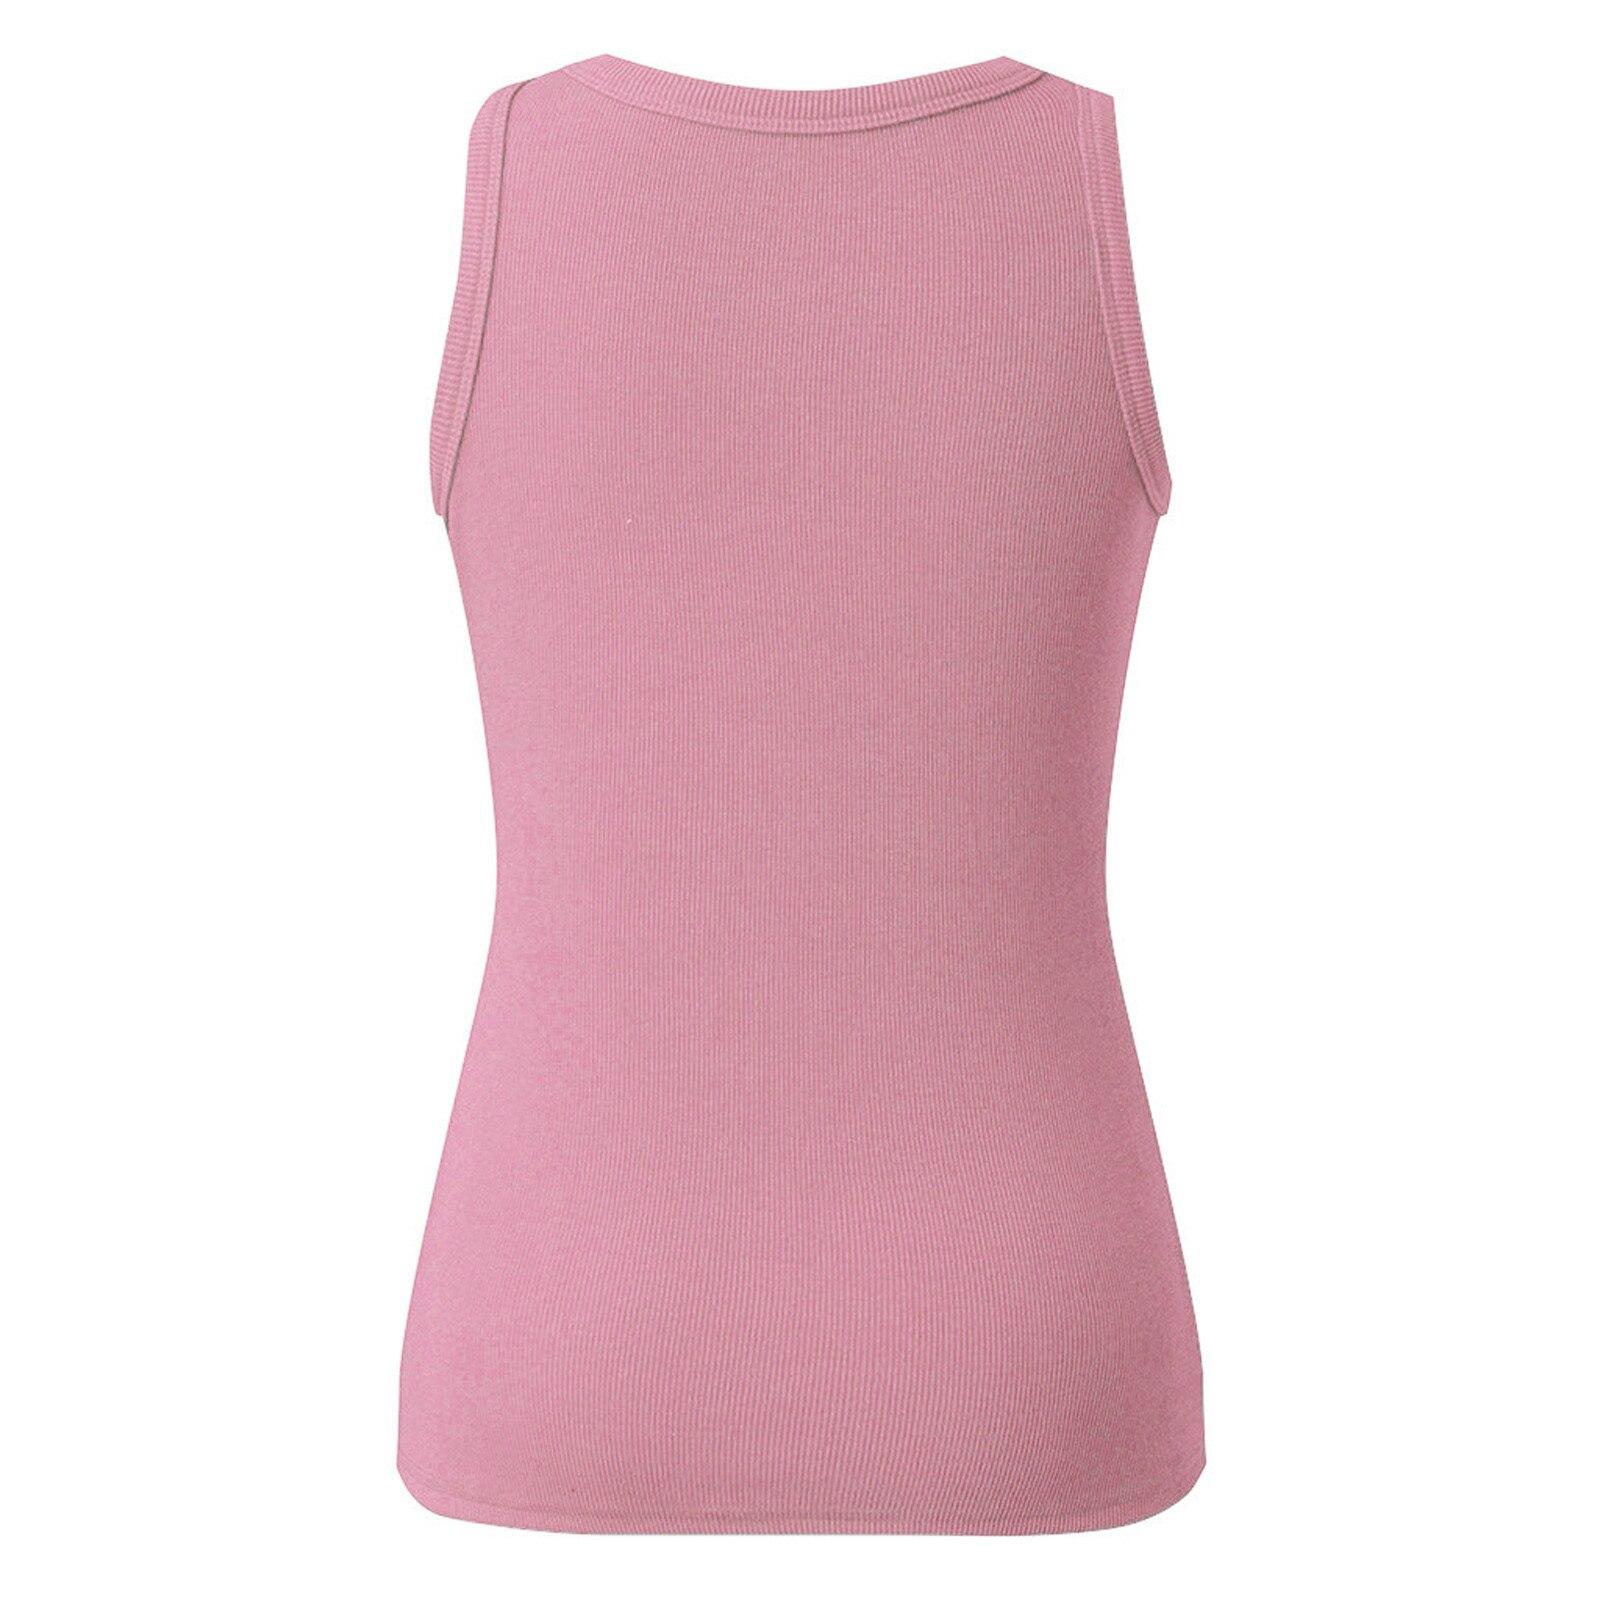 Women's O-neck Pullover Mesh Breathable Sleeveless Splicing T-shirt Tops Vests For Women 2021 Спортивный Топ Женский